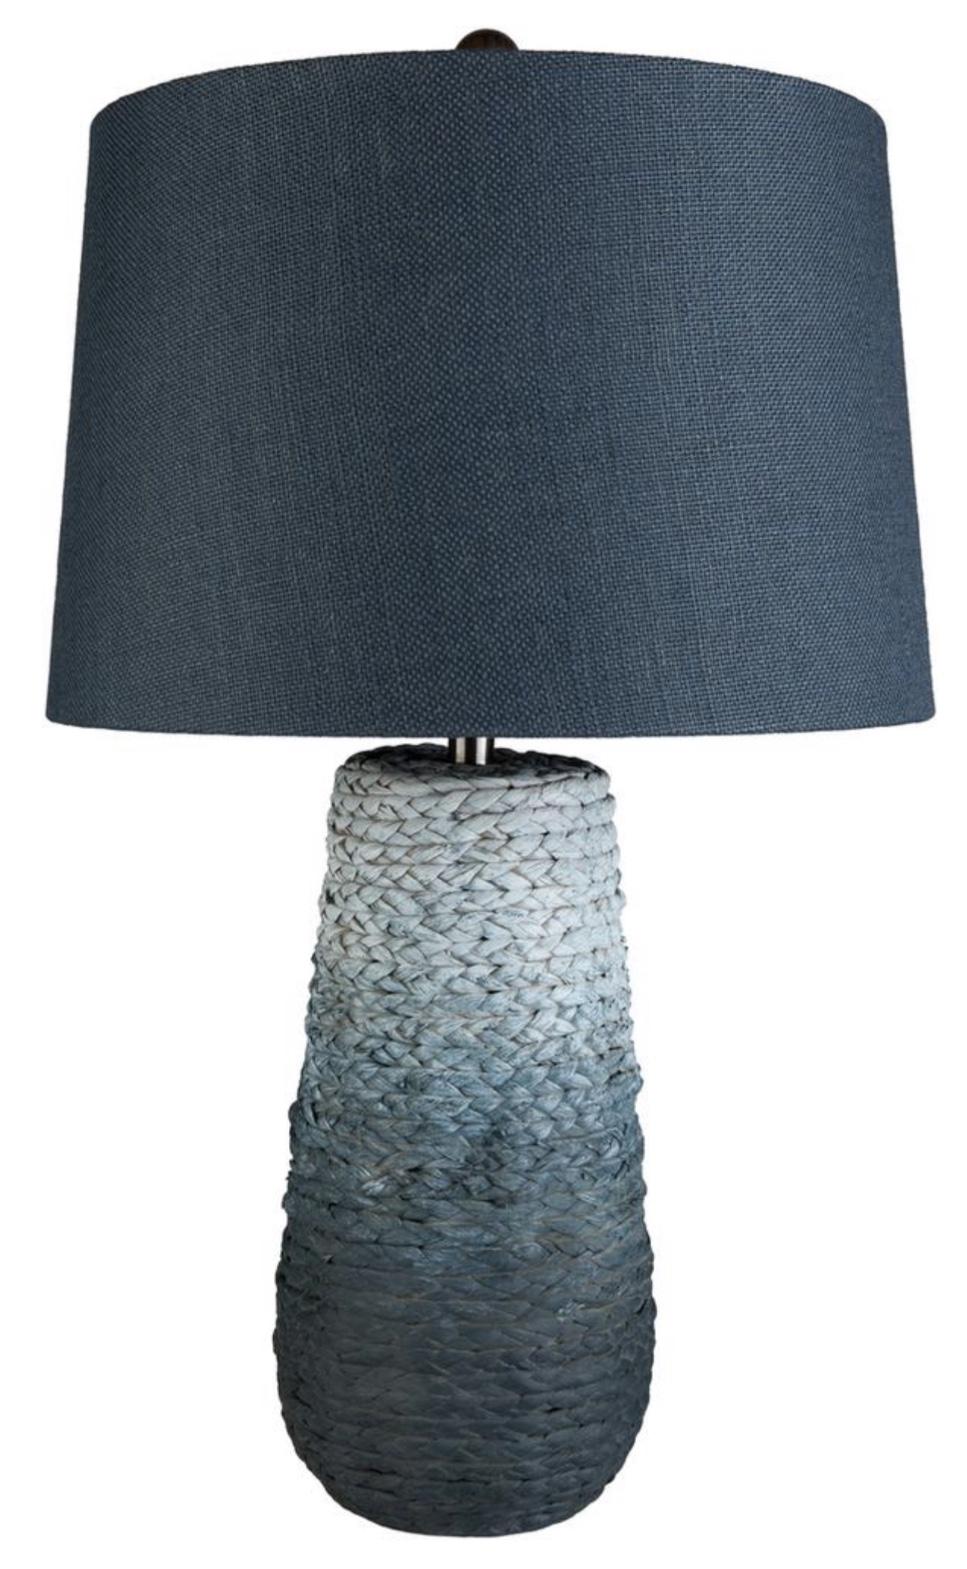 Mallory Table Lamp